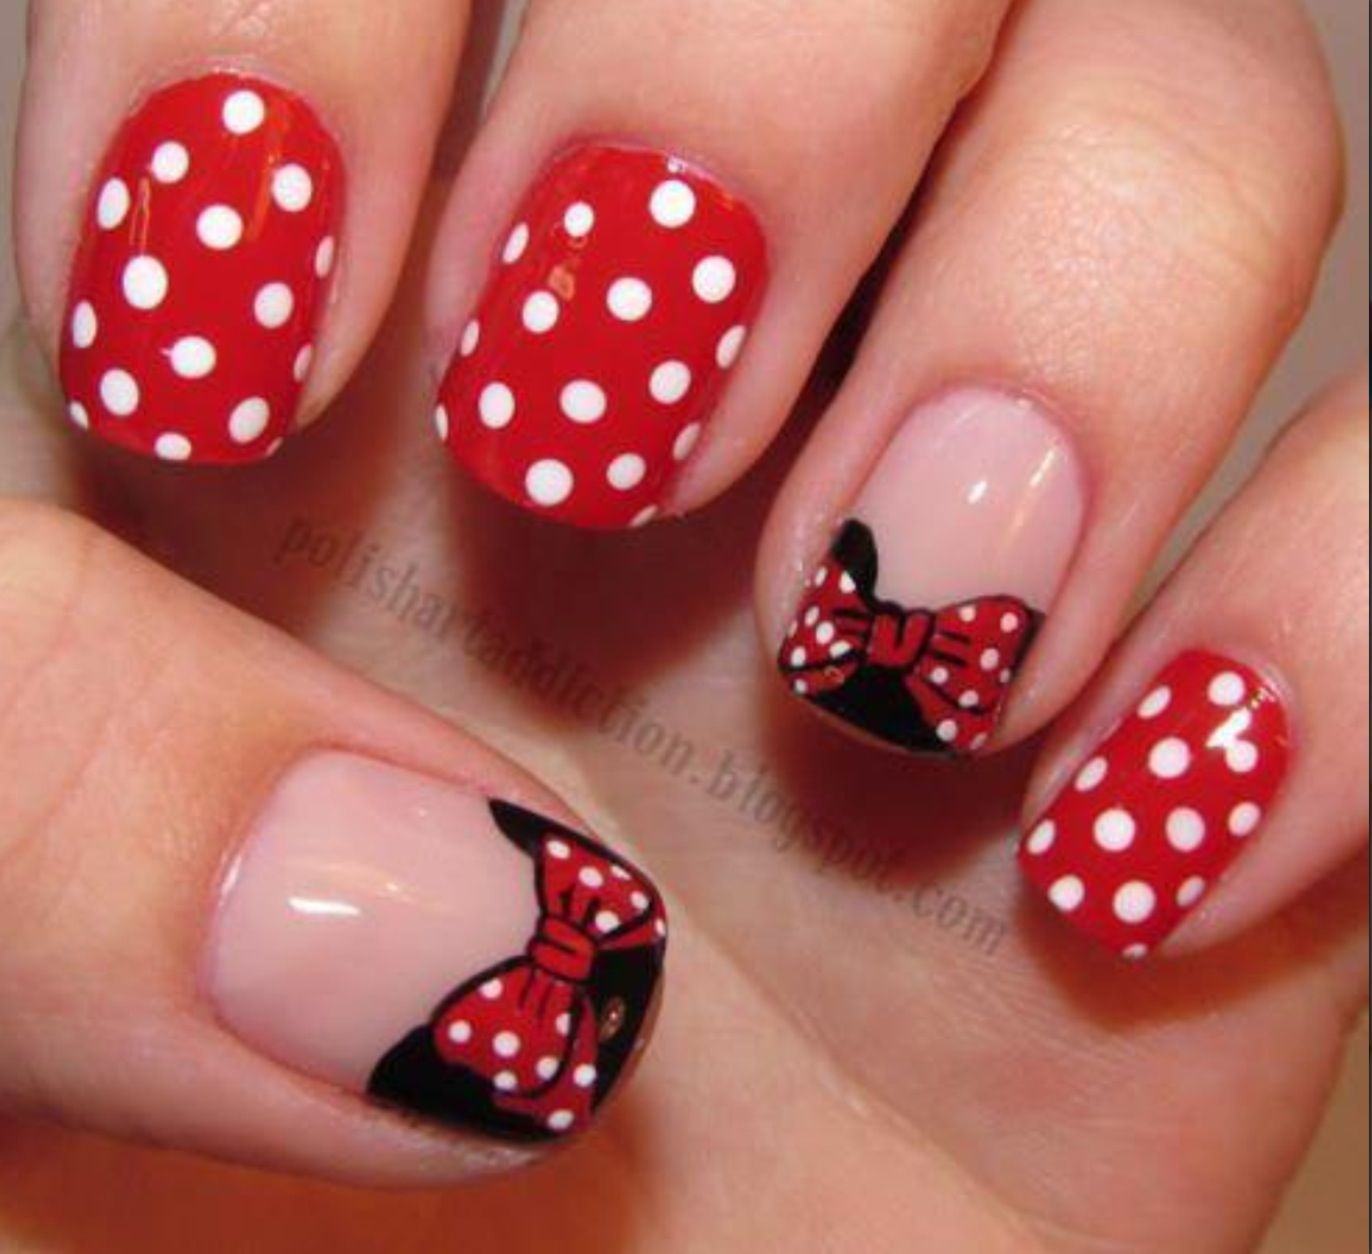 Minnie Mouse nails! | Nails | Pinterest | Me encantas, Encanta y De todo